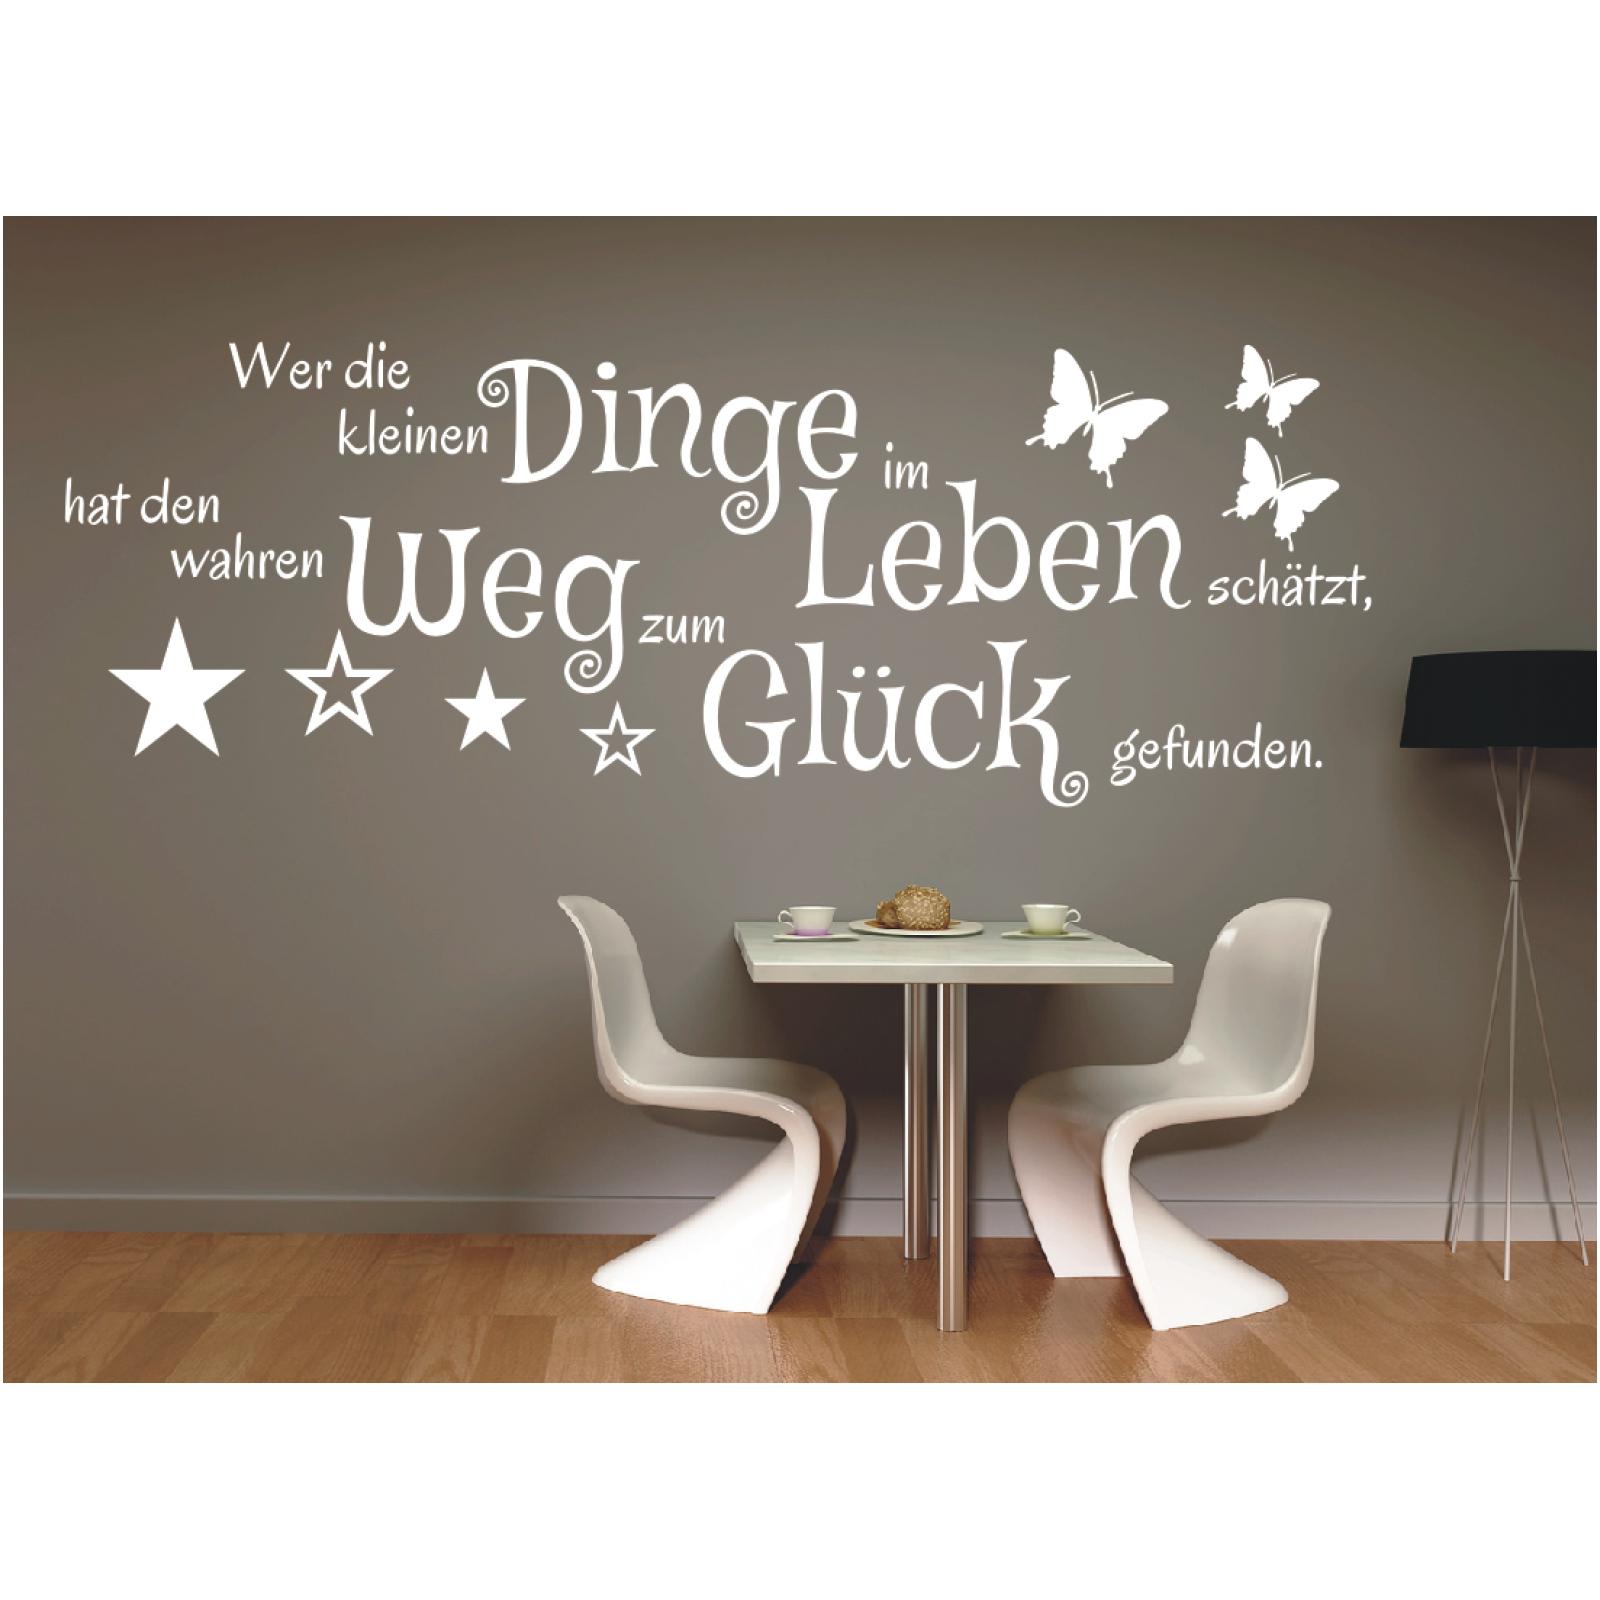 Spruch WANDTATTOO Dinge im Leben Weg Glück Wandsticker Wandaufkleber Sticker d